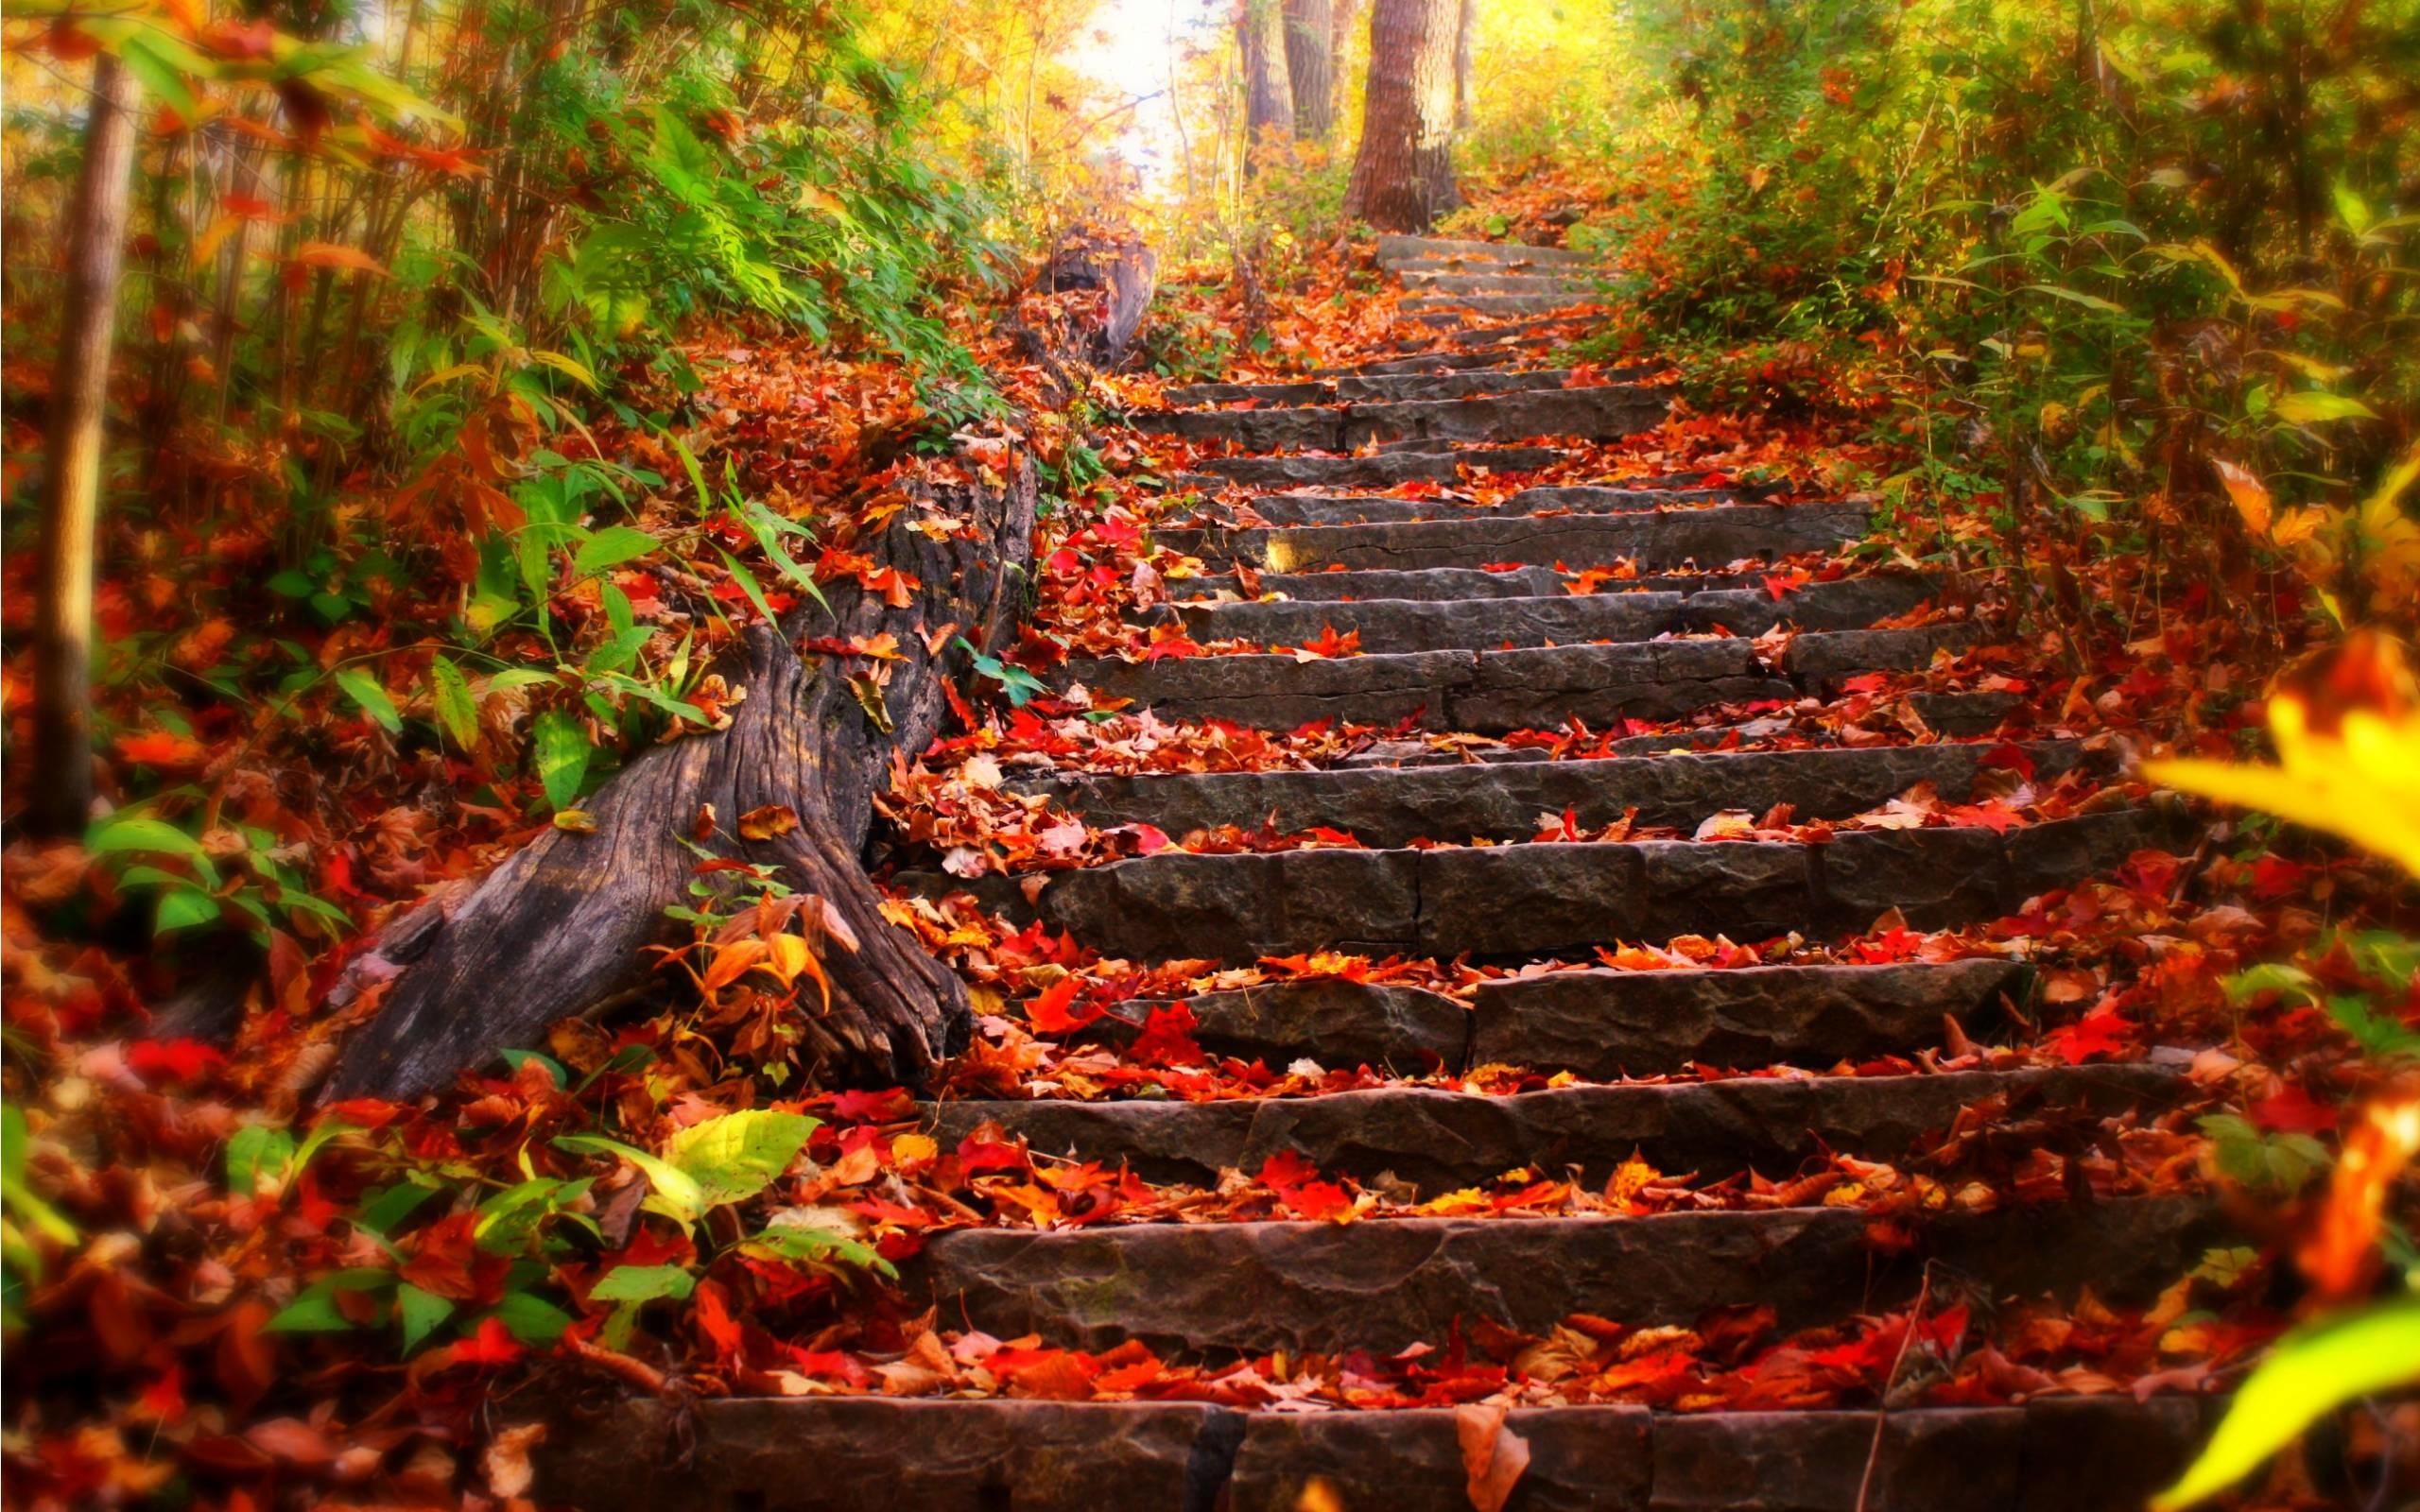 Fall Scenes Wallpaper And Screensavers 58 Images